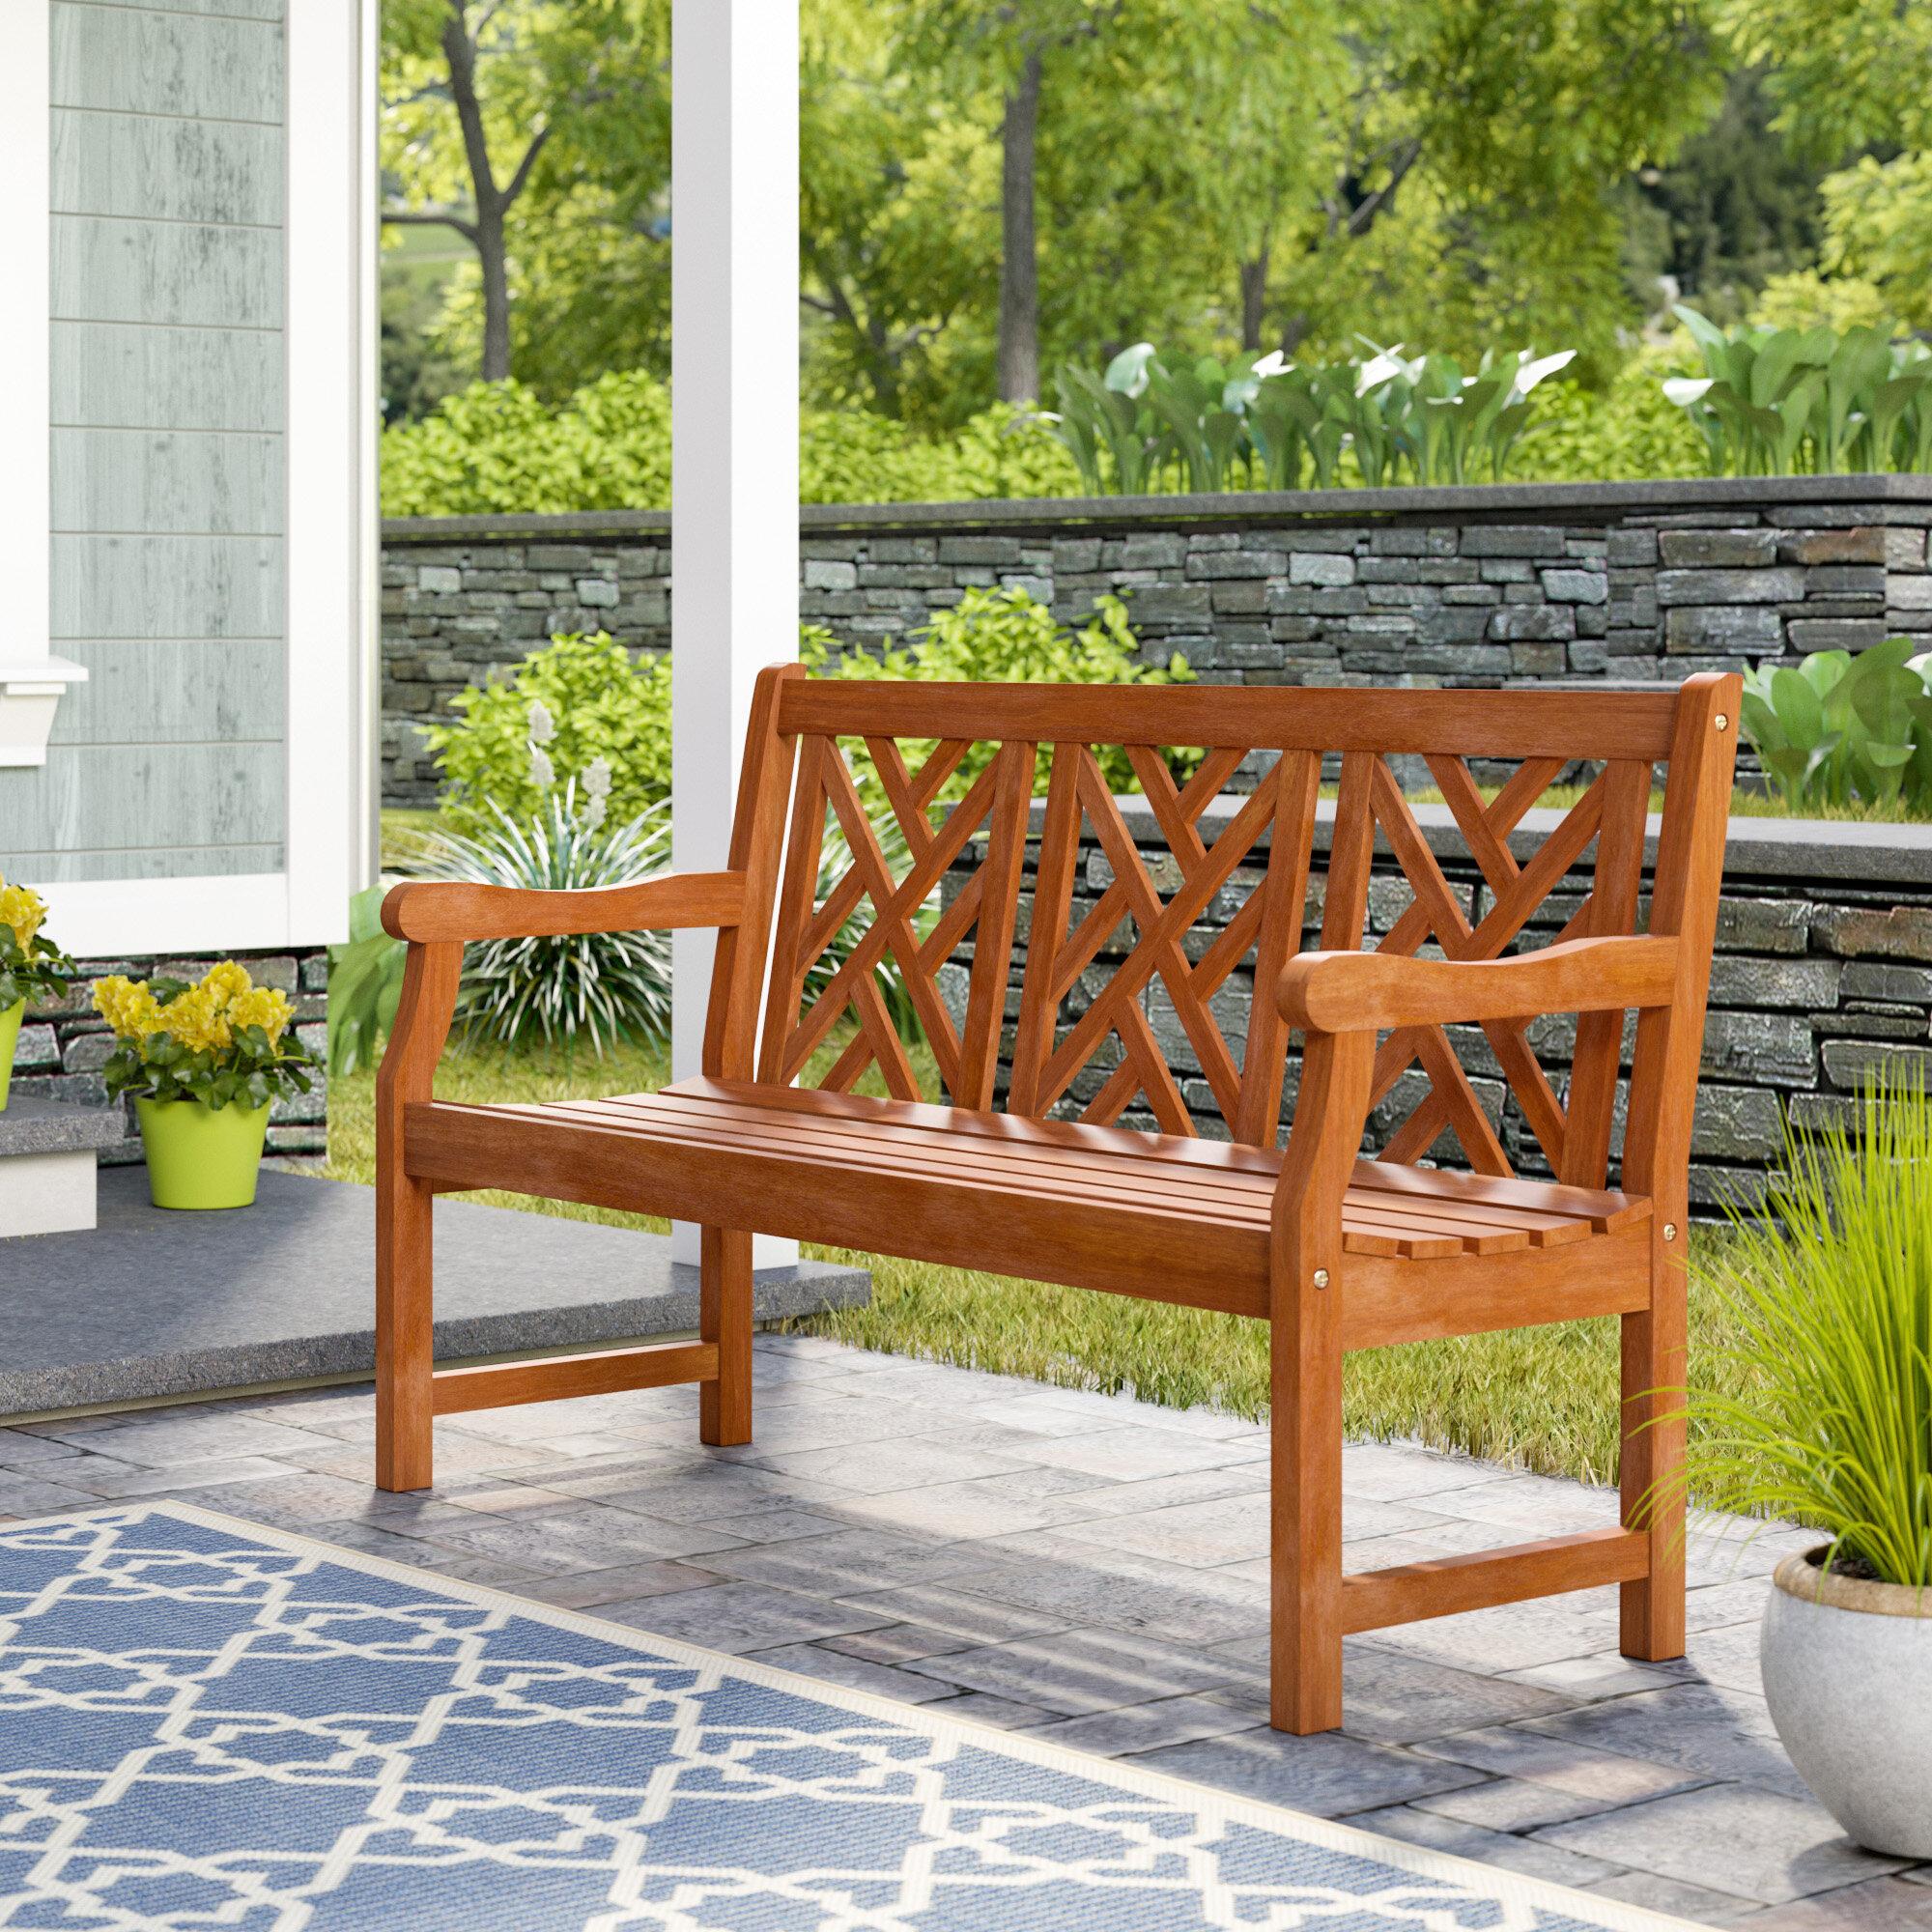 Amabel Wooden Garden Bench With Regard To Avoca Wood Garden Benches (View 4 of 25)